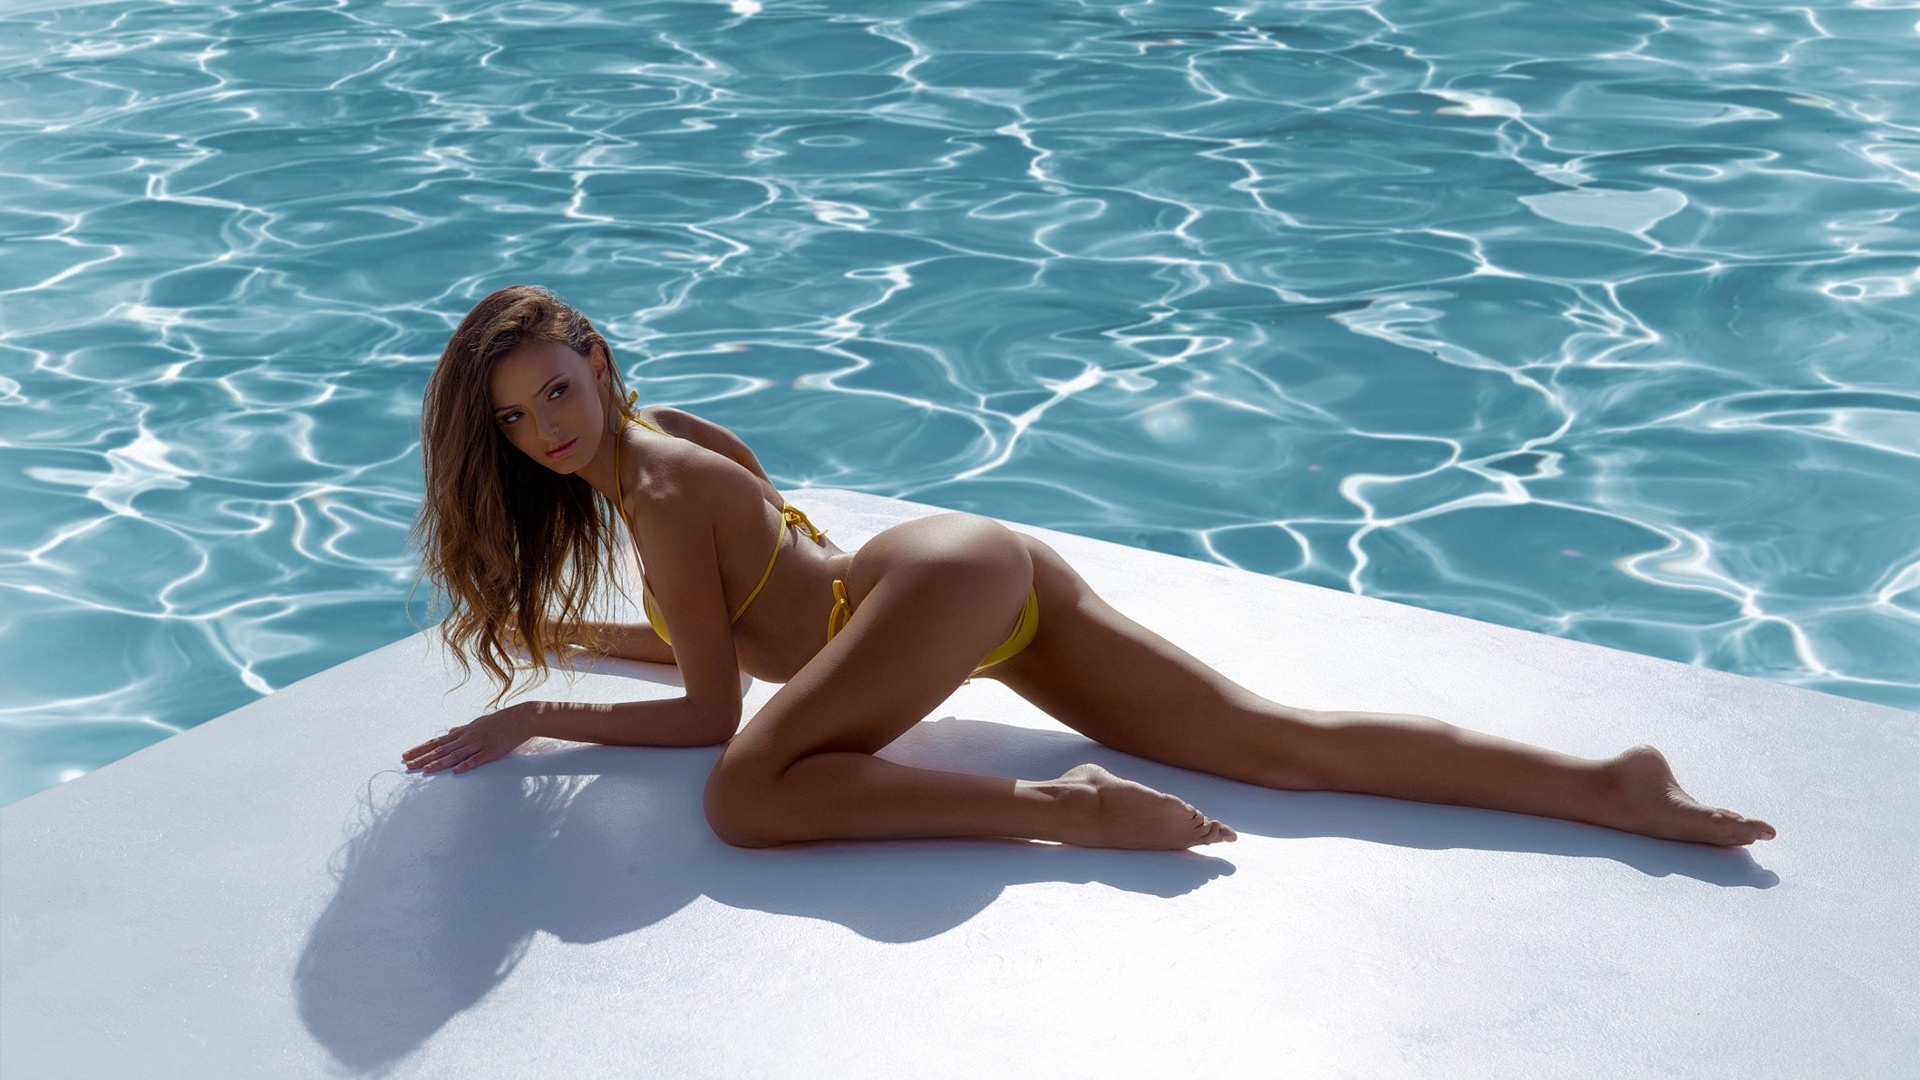 Noelle Santorini skinny stunning blonde bikini model by ...